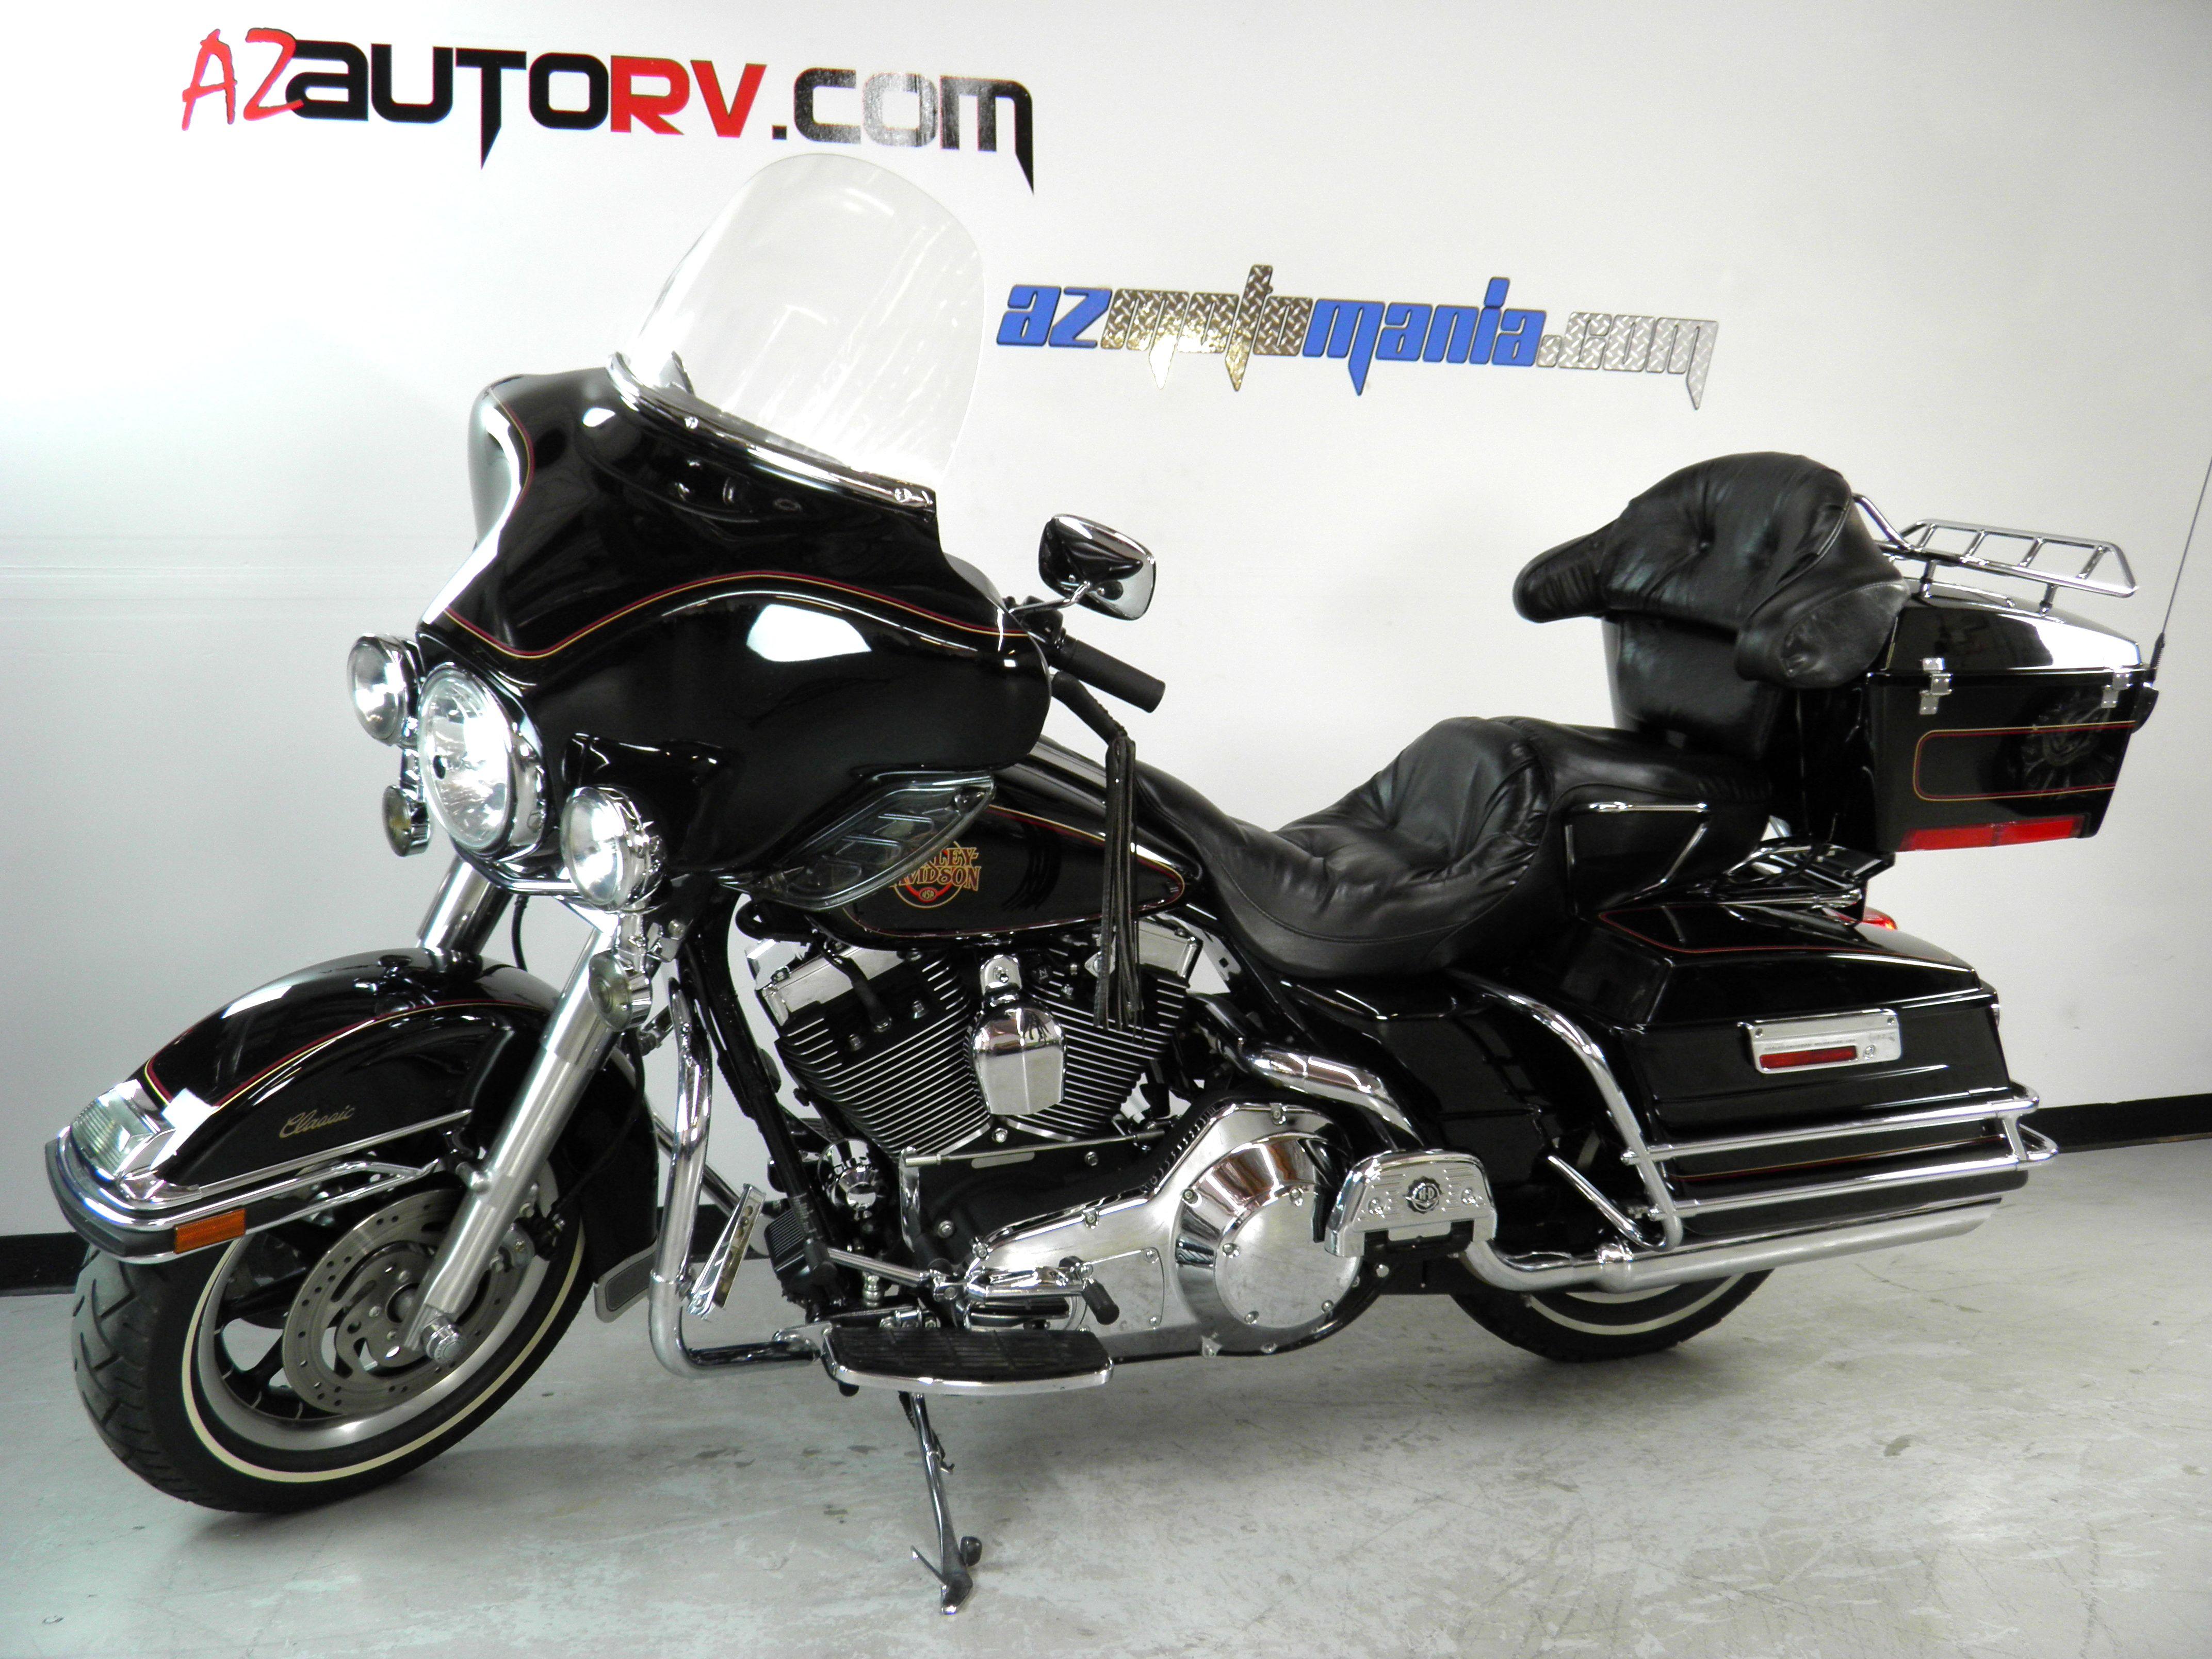 2002 Harley Davidson Flhtc Electra Glide Classic Electra Glide Classic Harley Davidson Electra Glide [ 3216 x 4288 Pixel ]